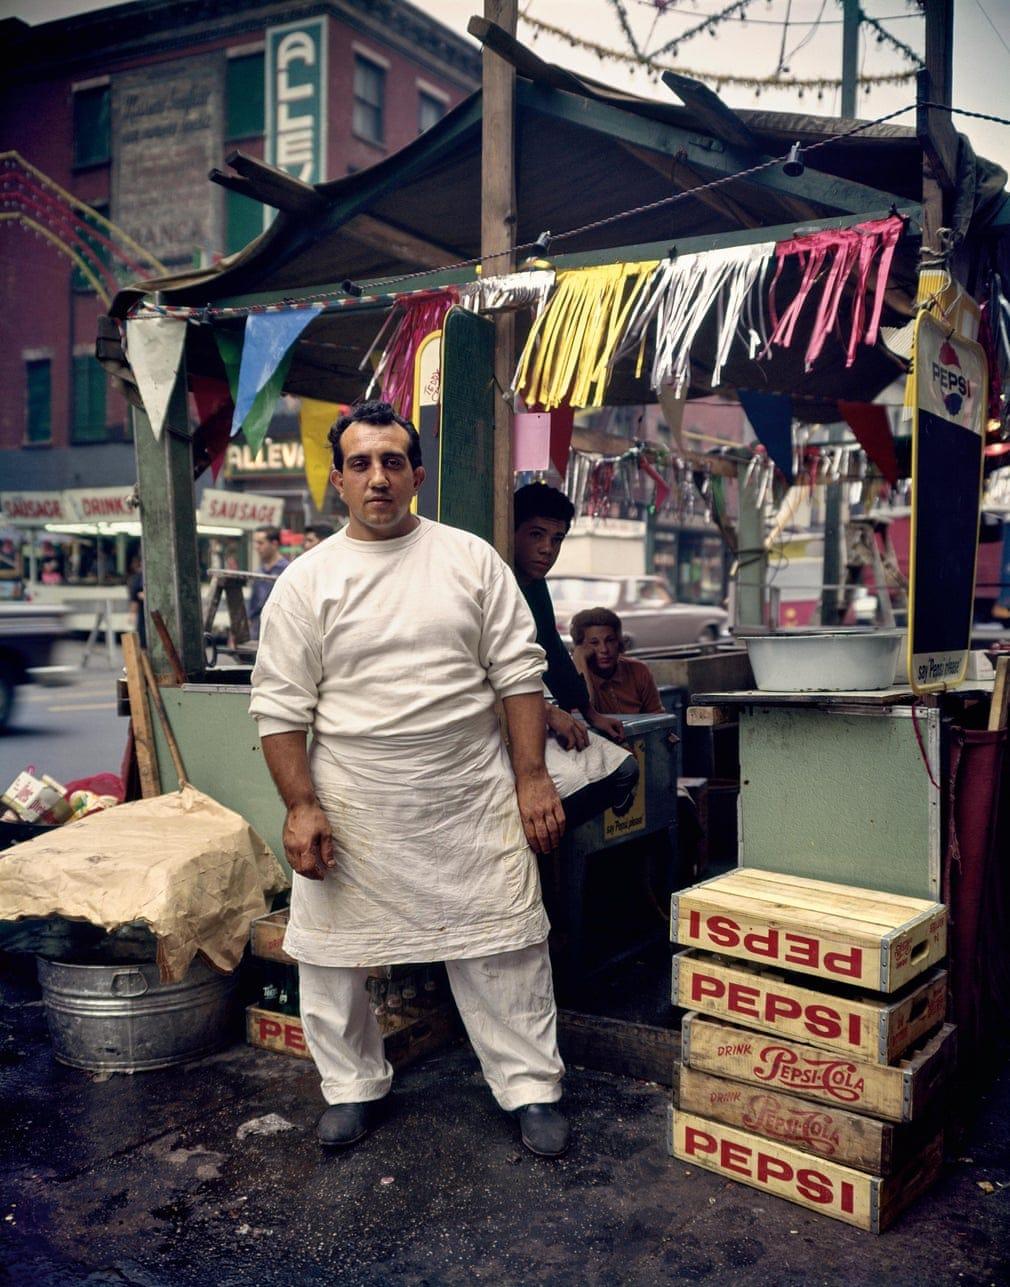 Hotdog stand, 1963, New York - Evelyn Hofer